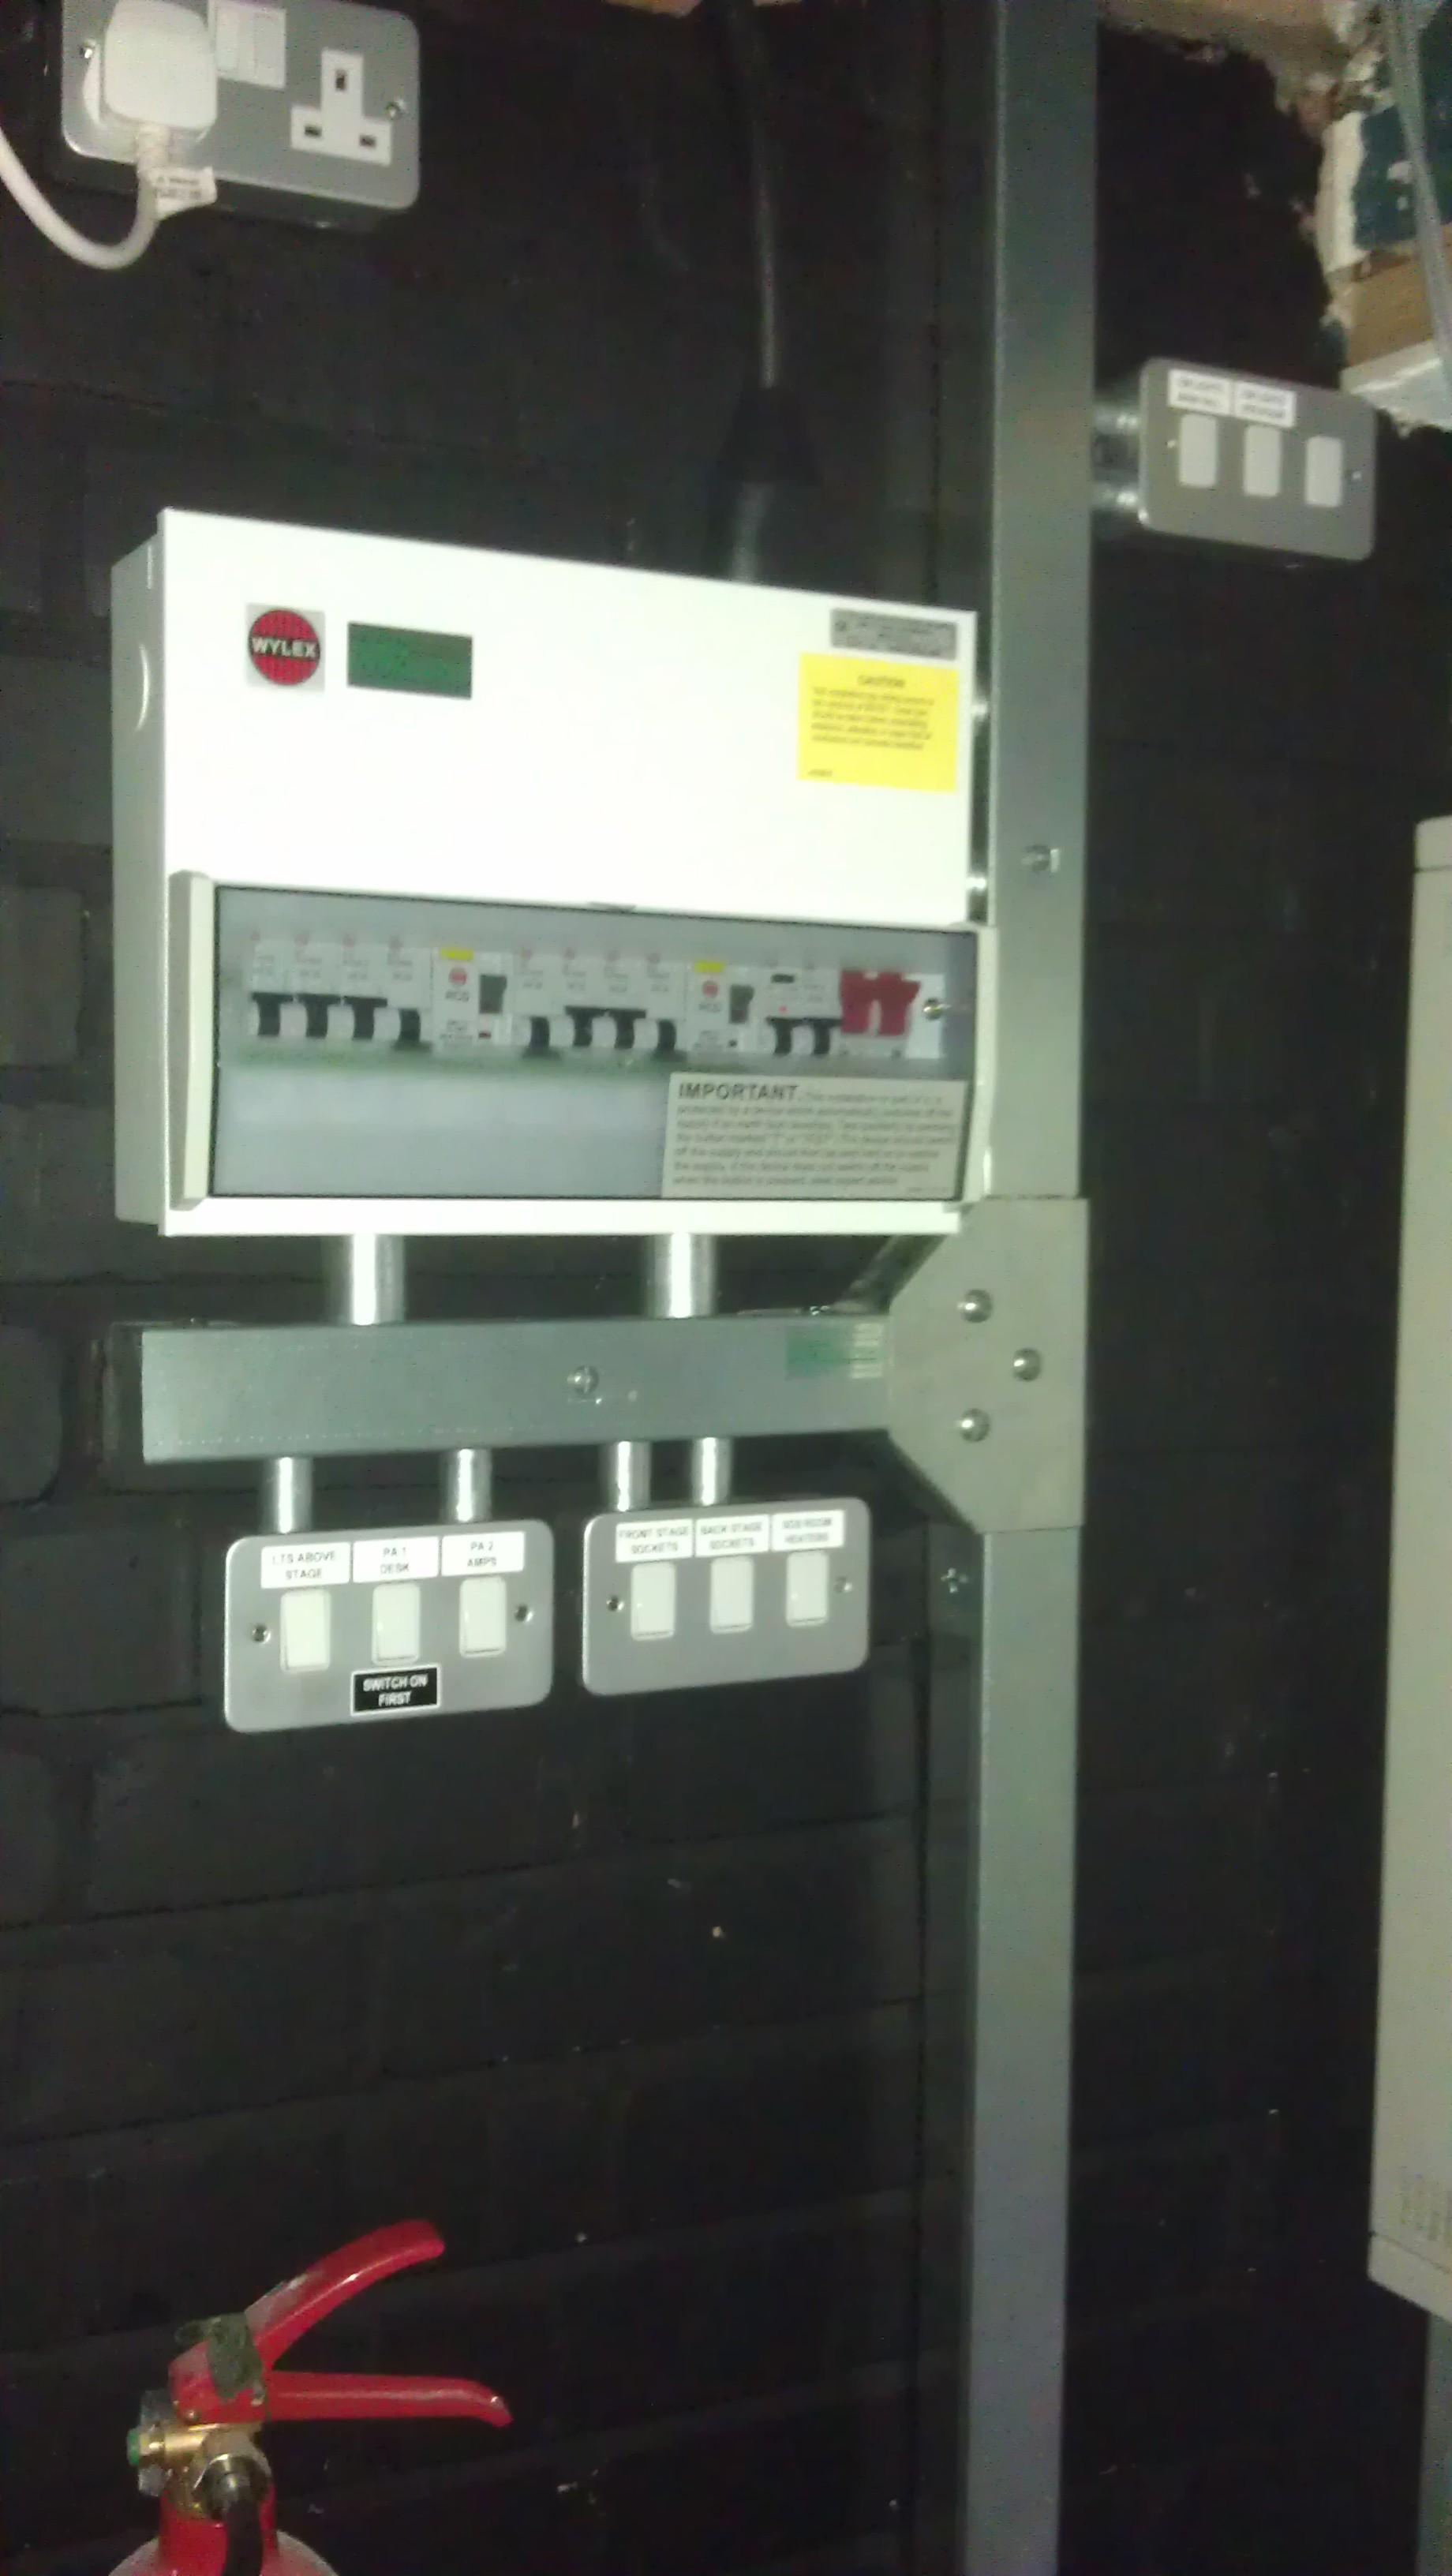 imag0148